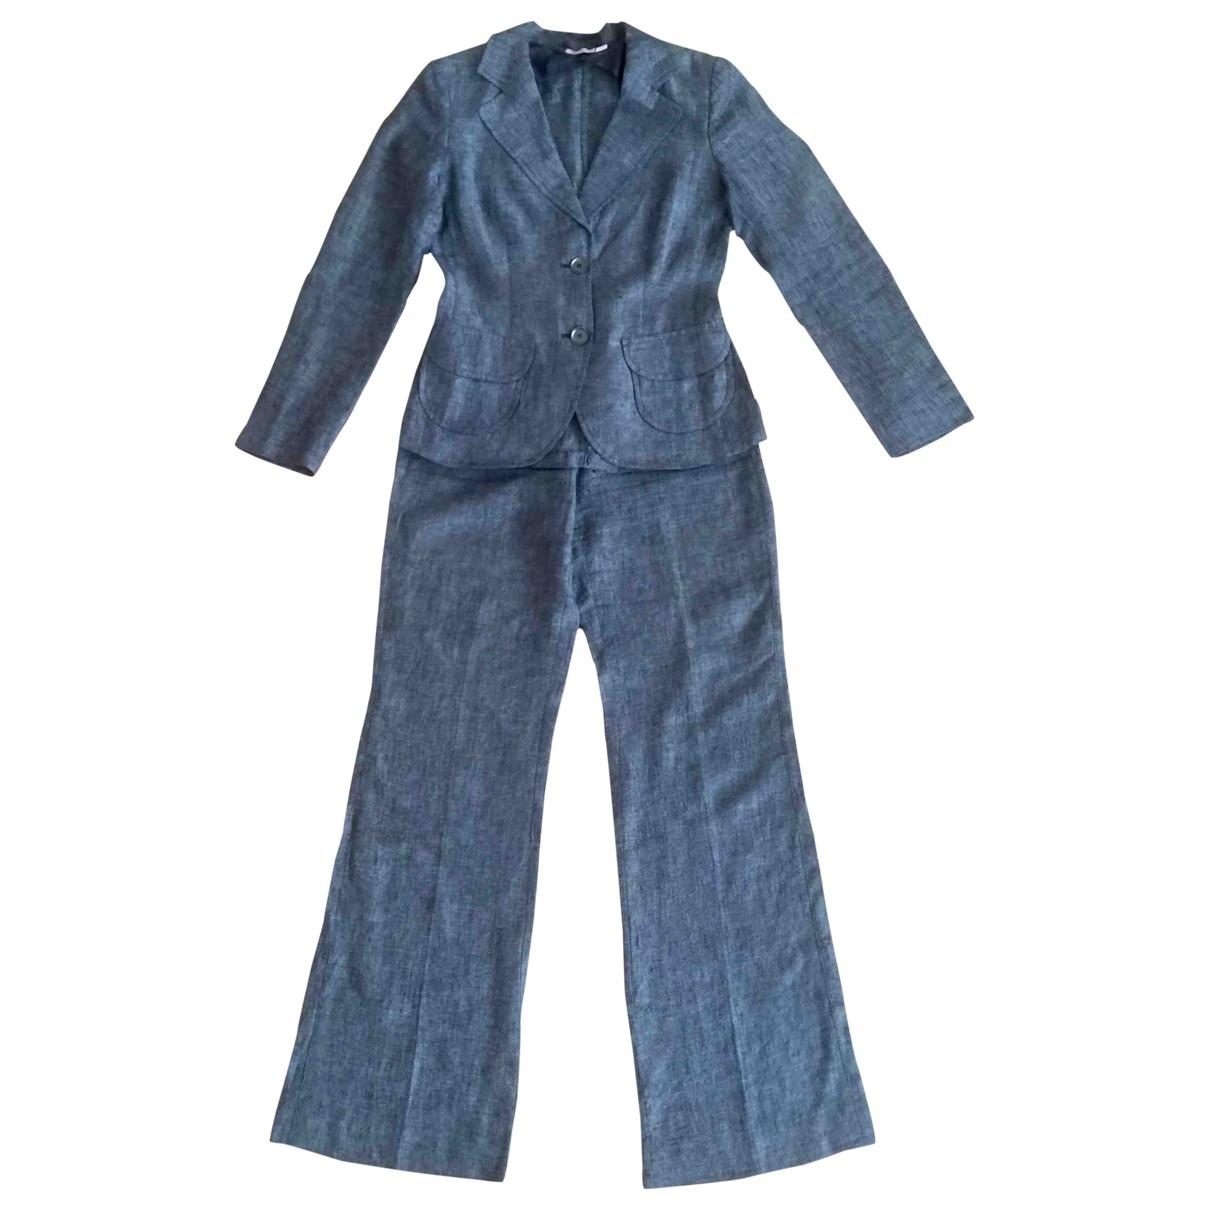 Max & Co \N Kleid in  Grau Leinen